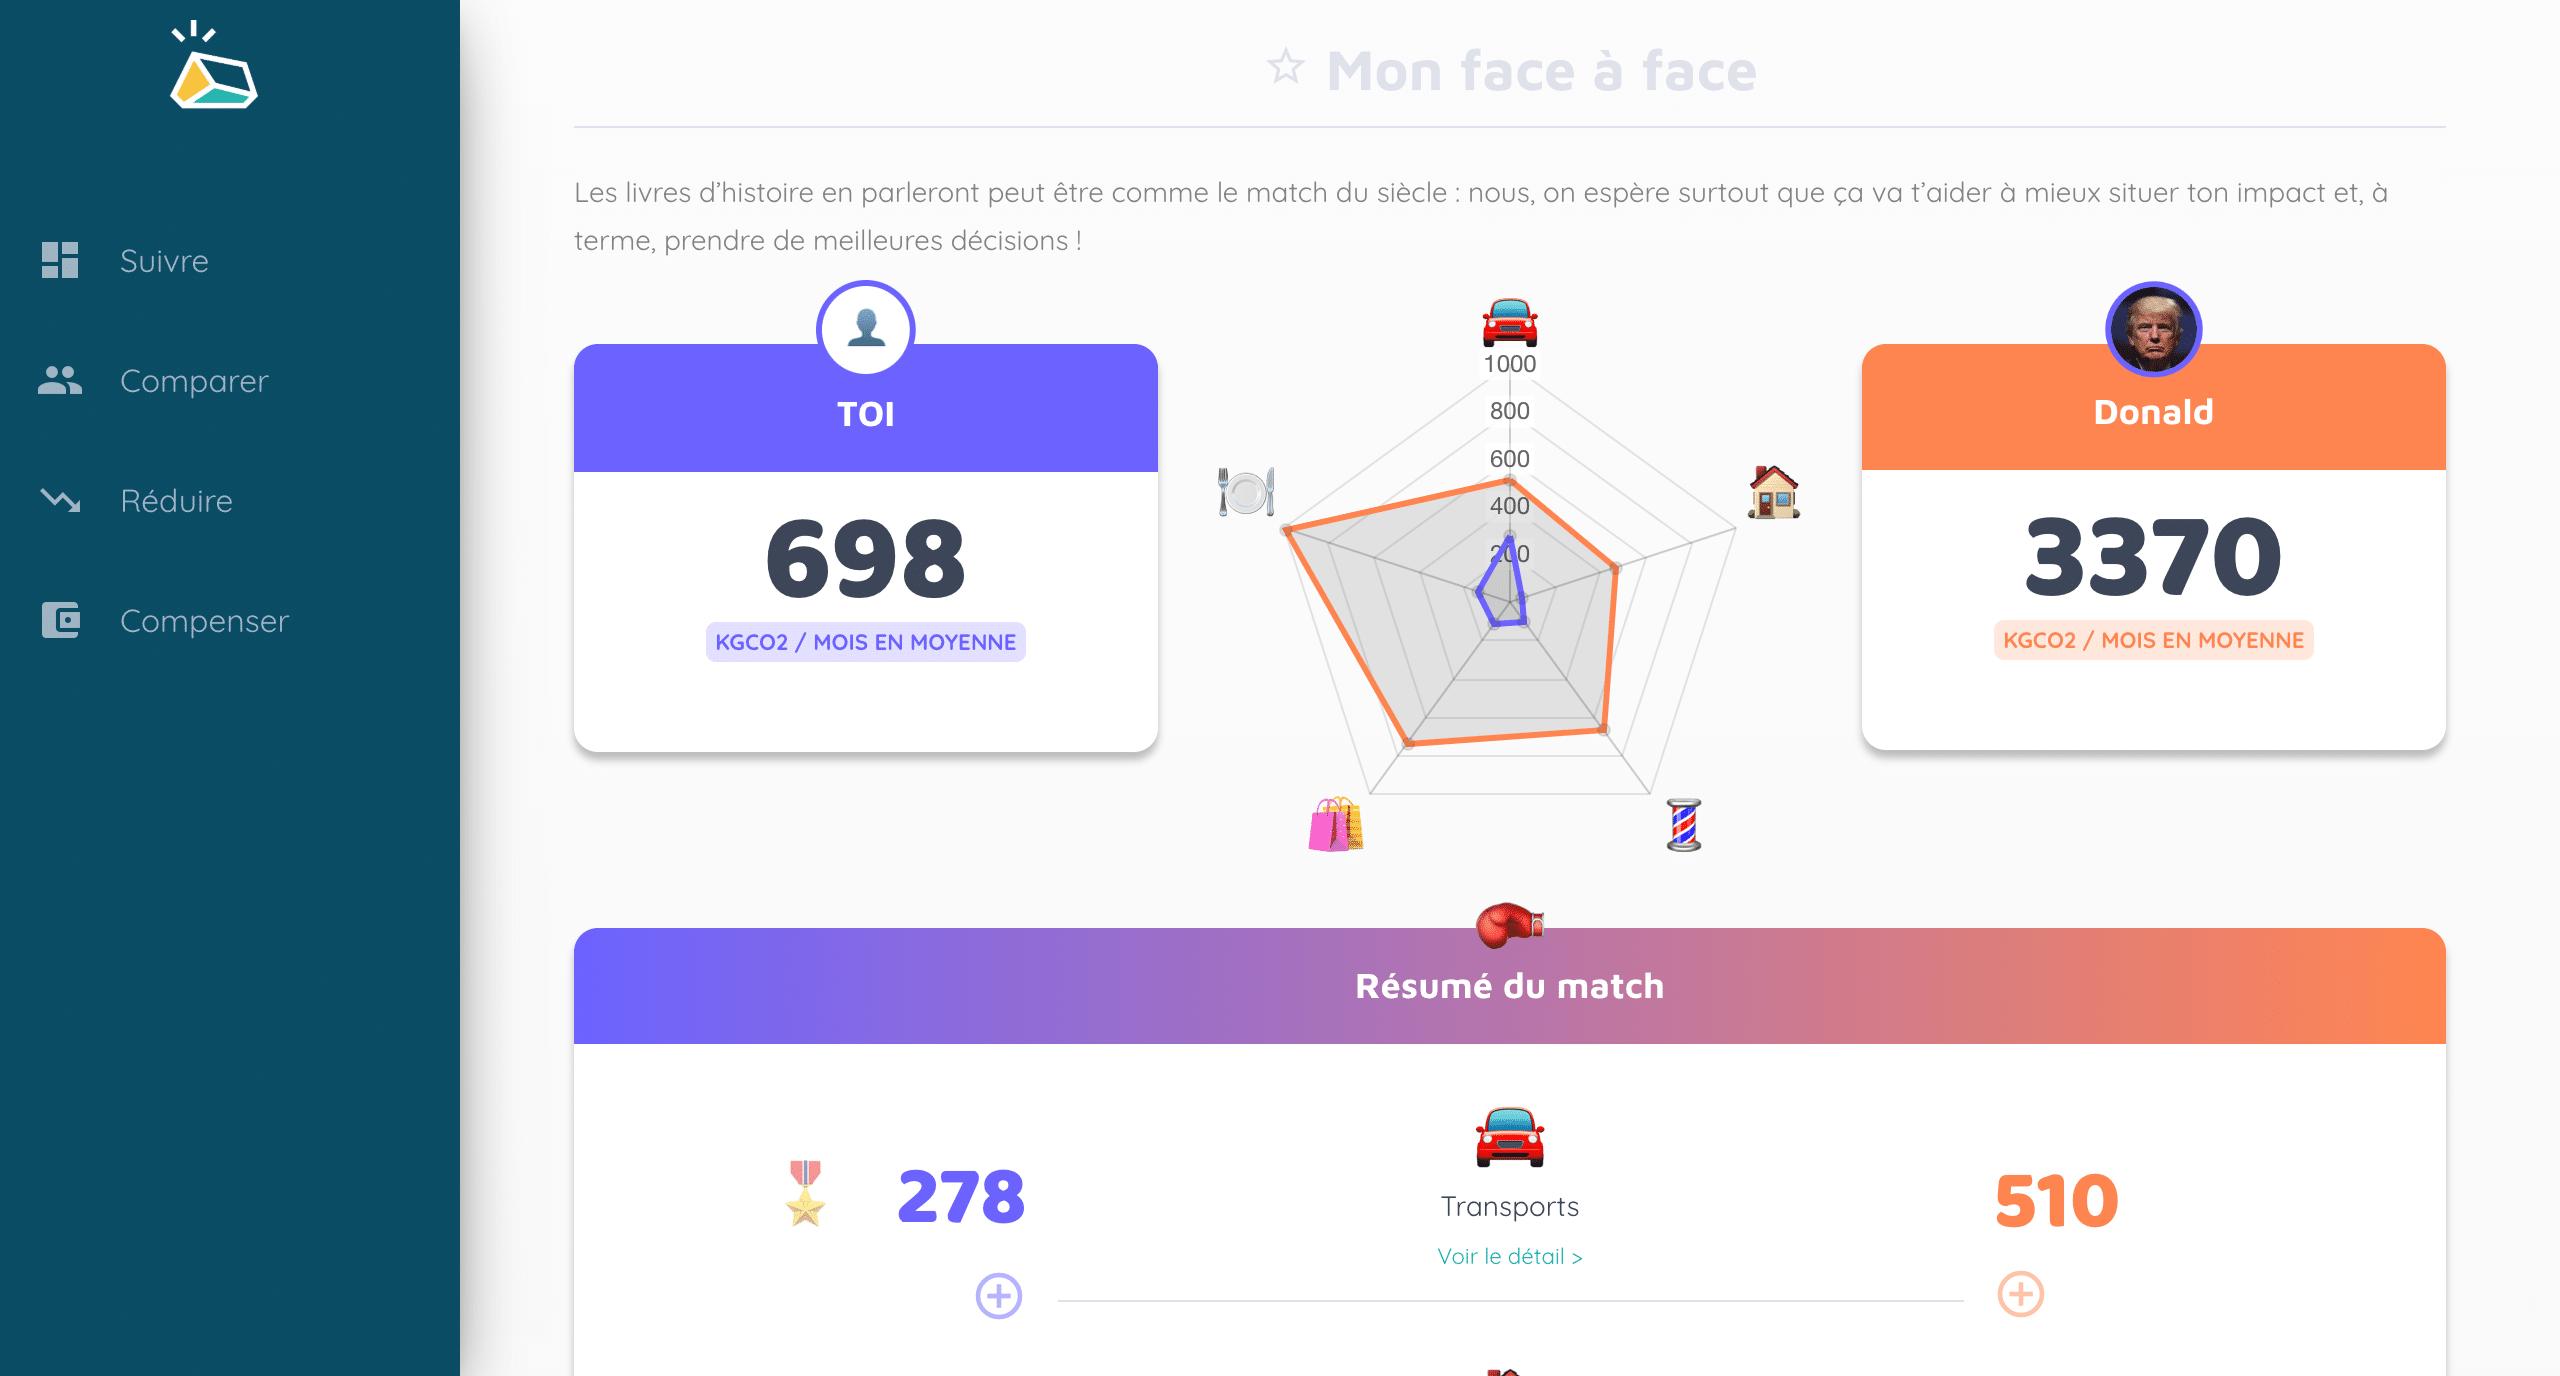 Screenshot - Comparer